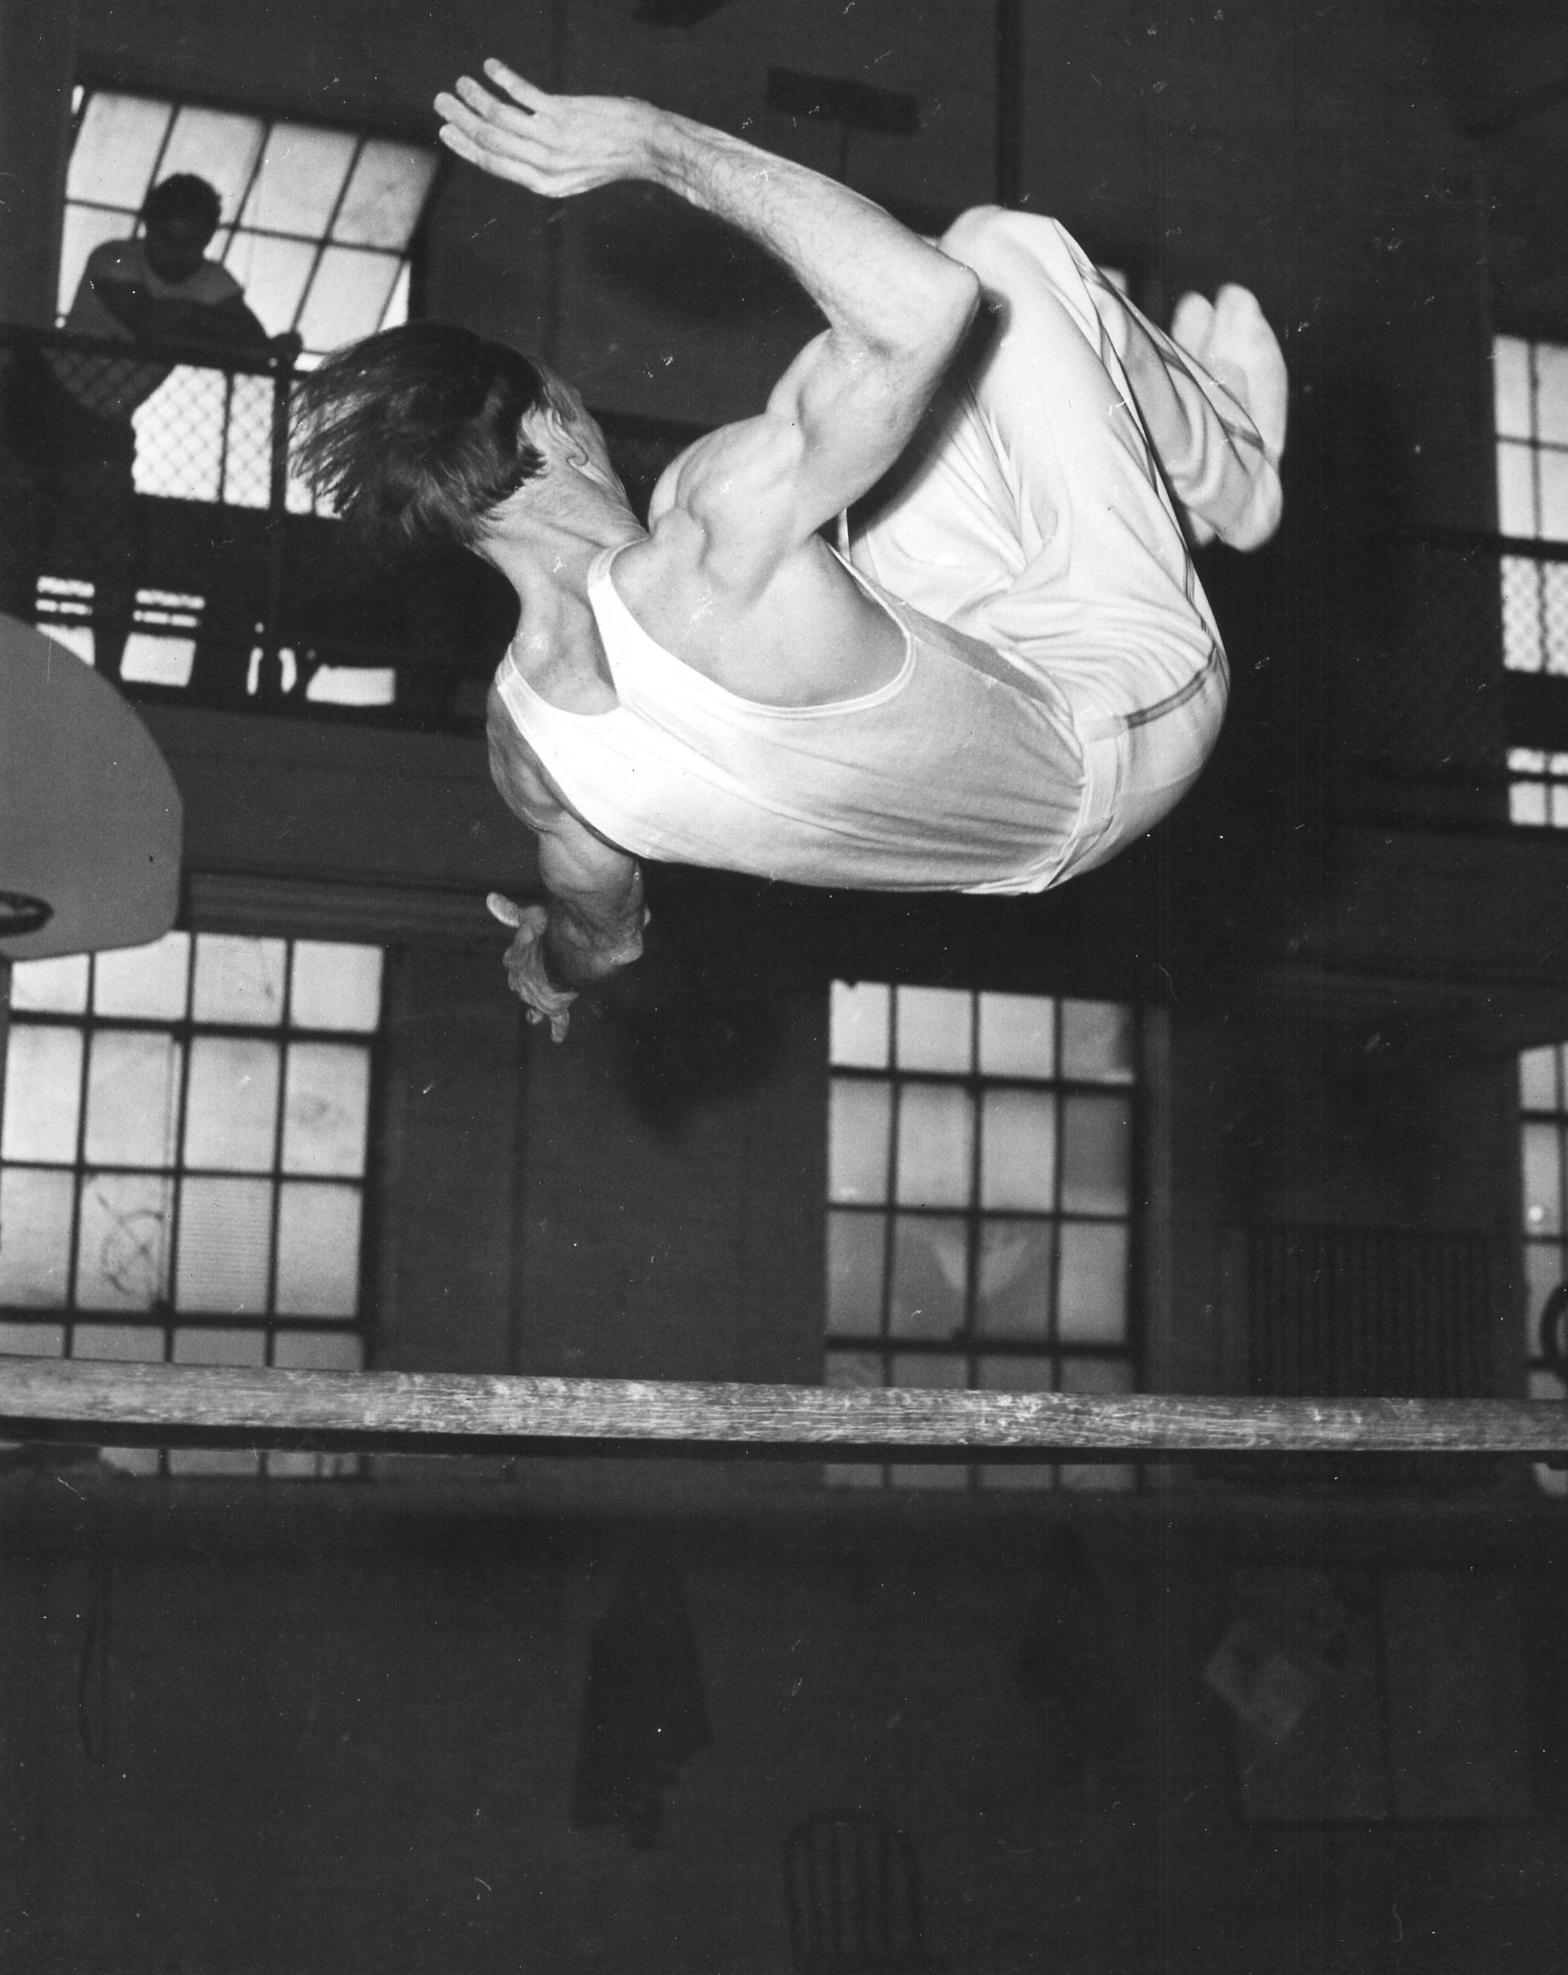 Joe Herring on Parallel Bars (1950)